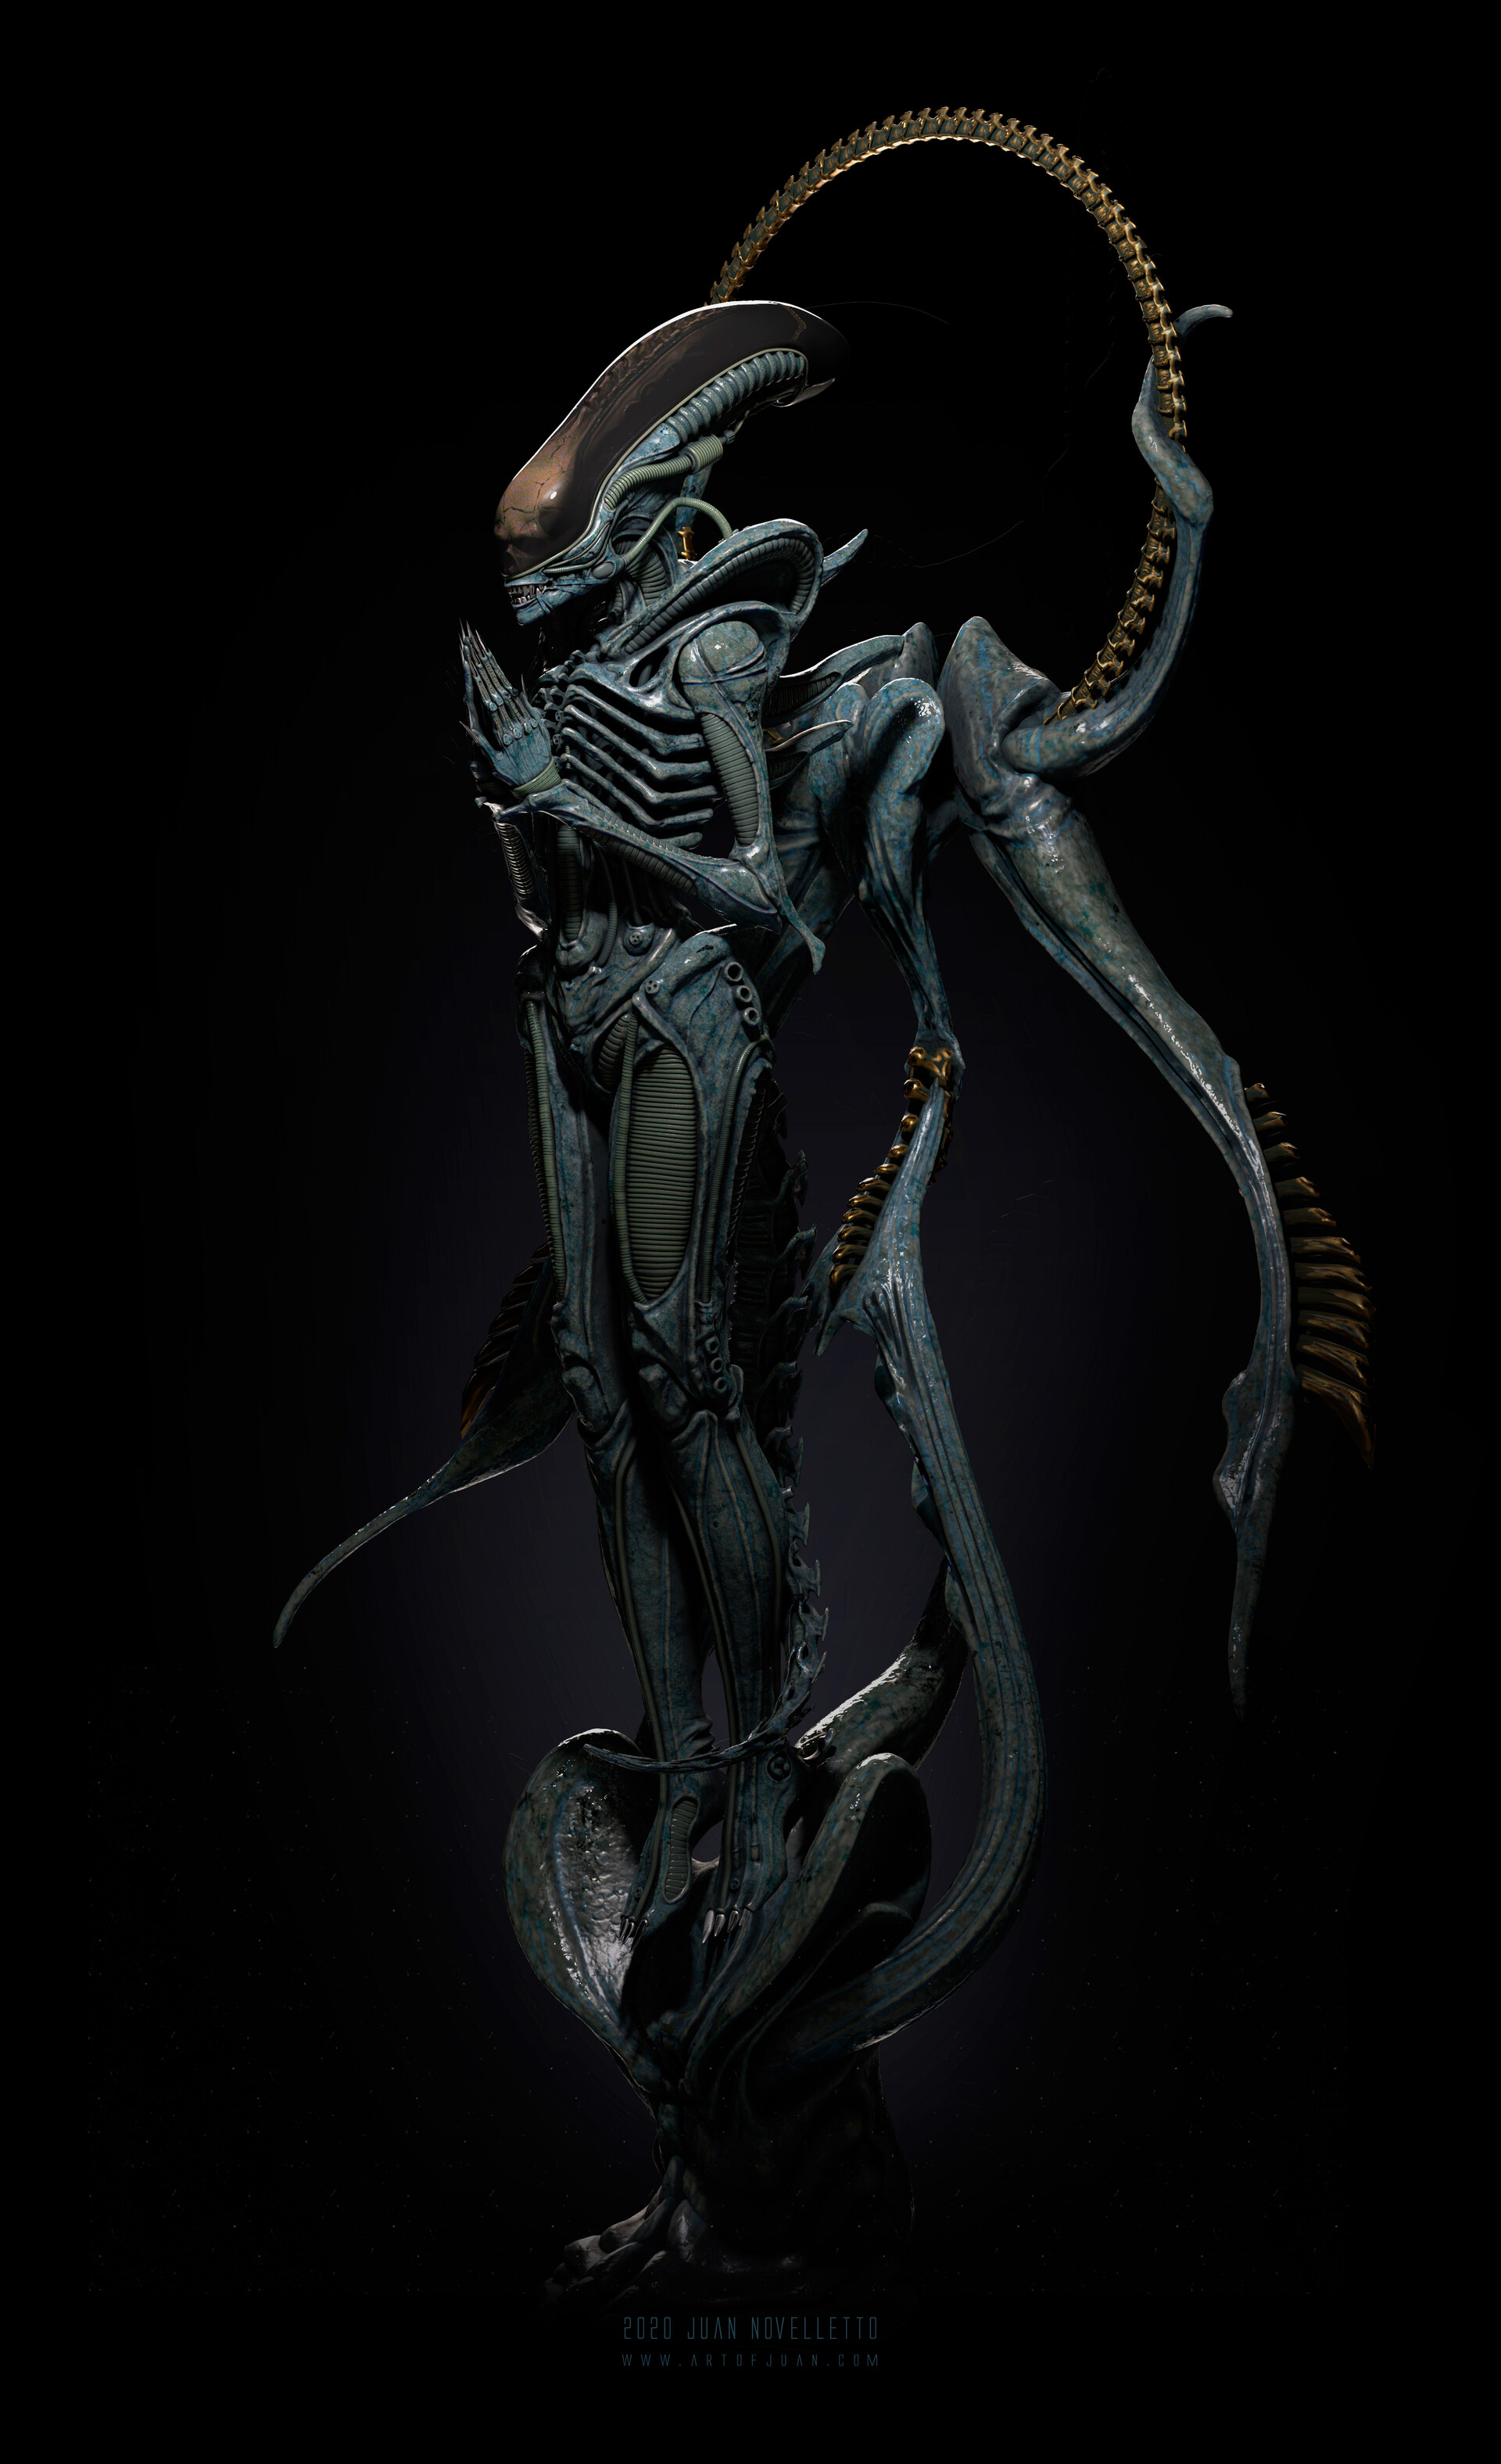 Alien xenomorph praying